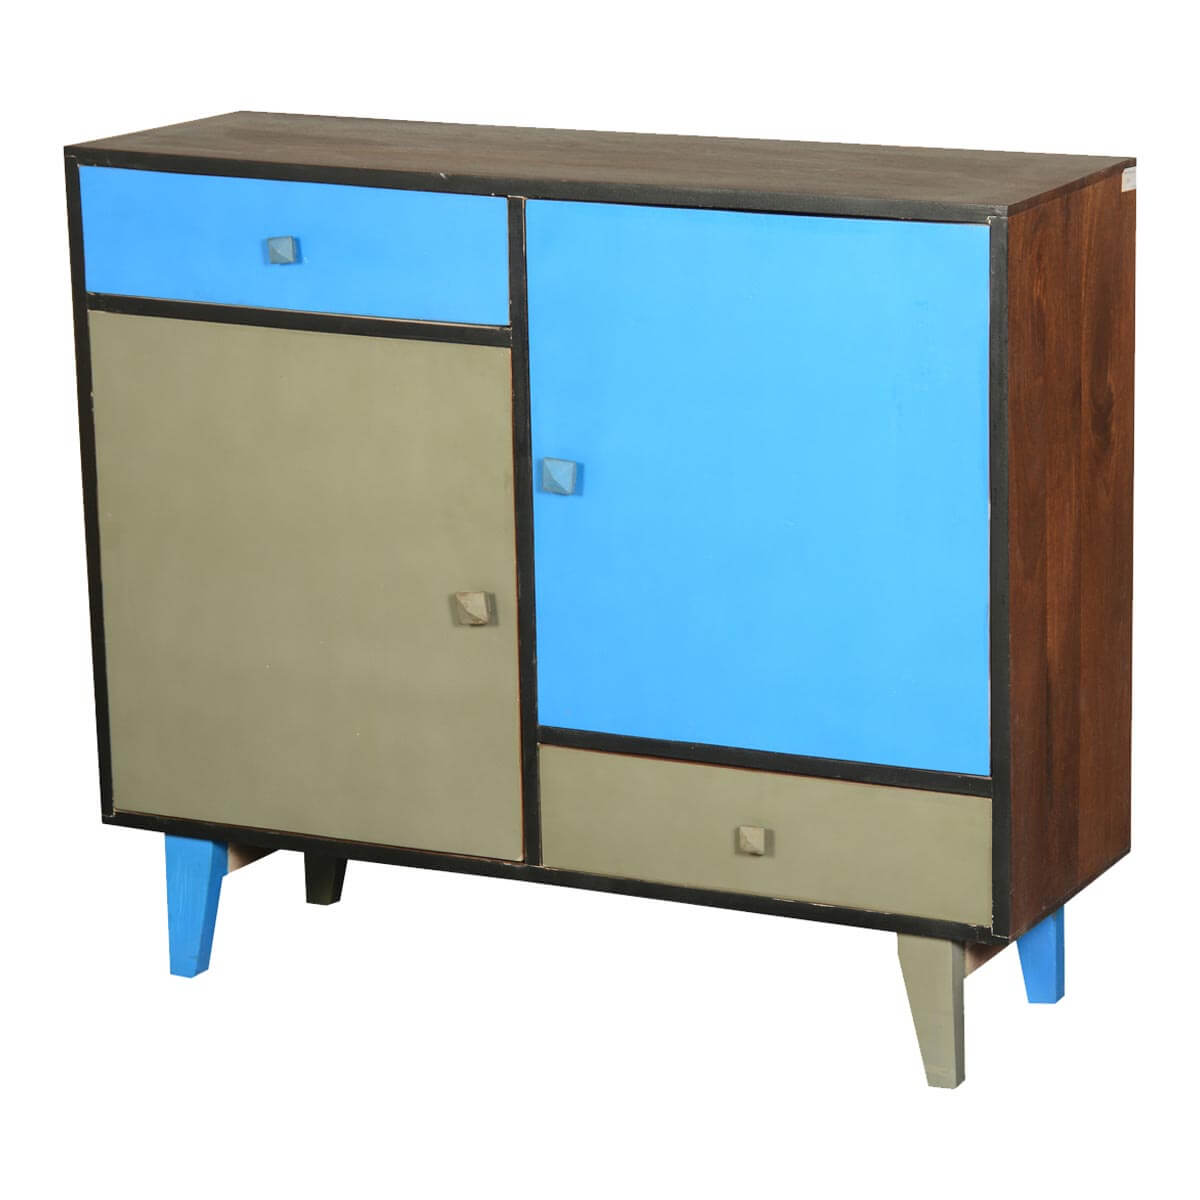 60's Retro Blue & Gray Mango Wood Standing Console Cabinet